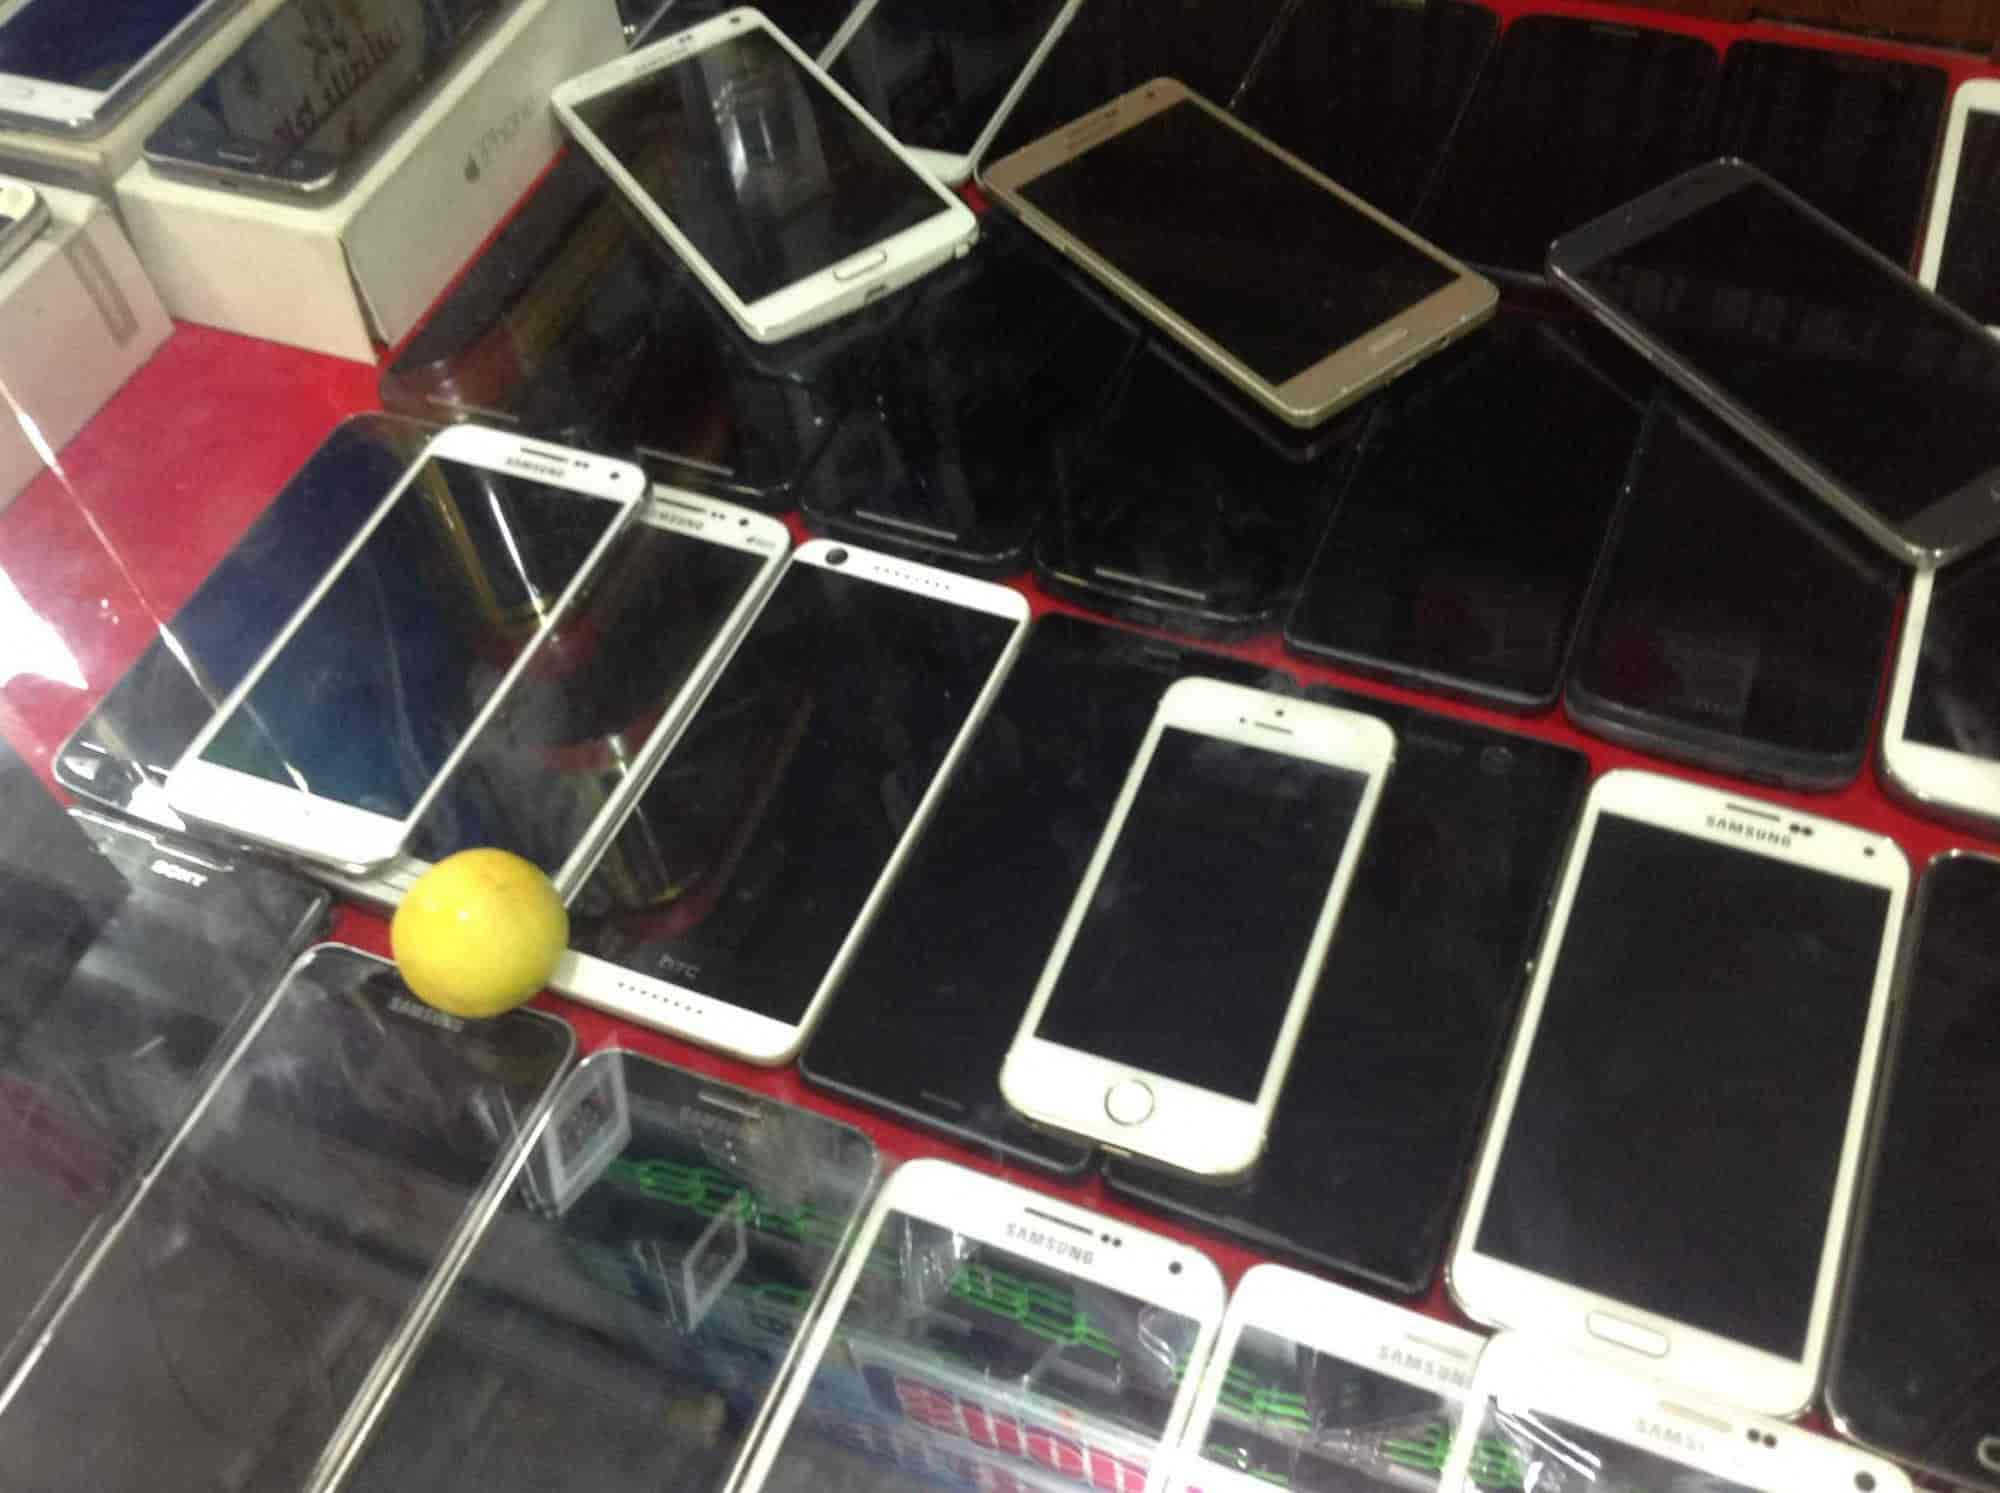 Ashapura telecom, Borivali West - Second Hand Mobile Phone Dealers